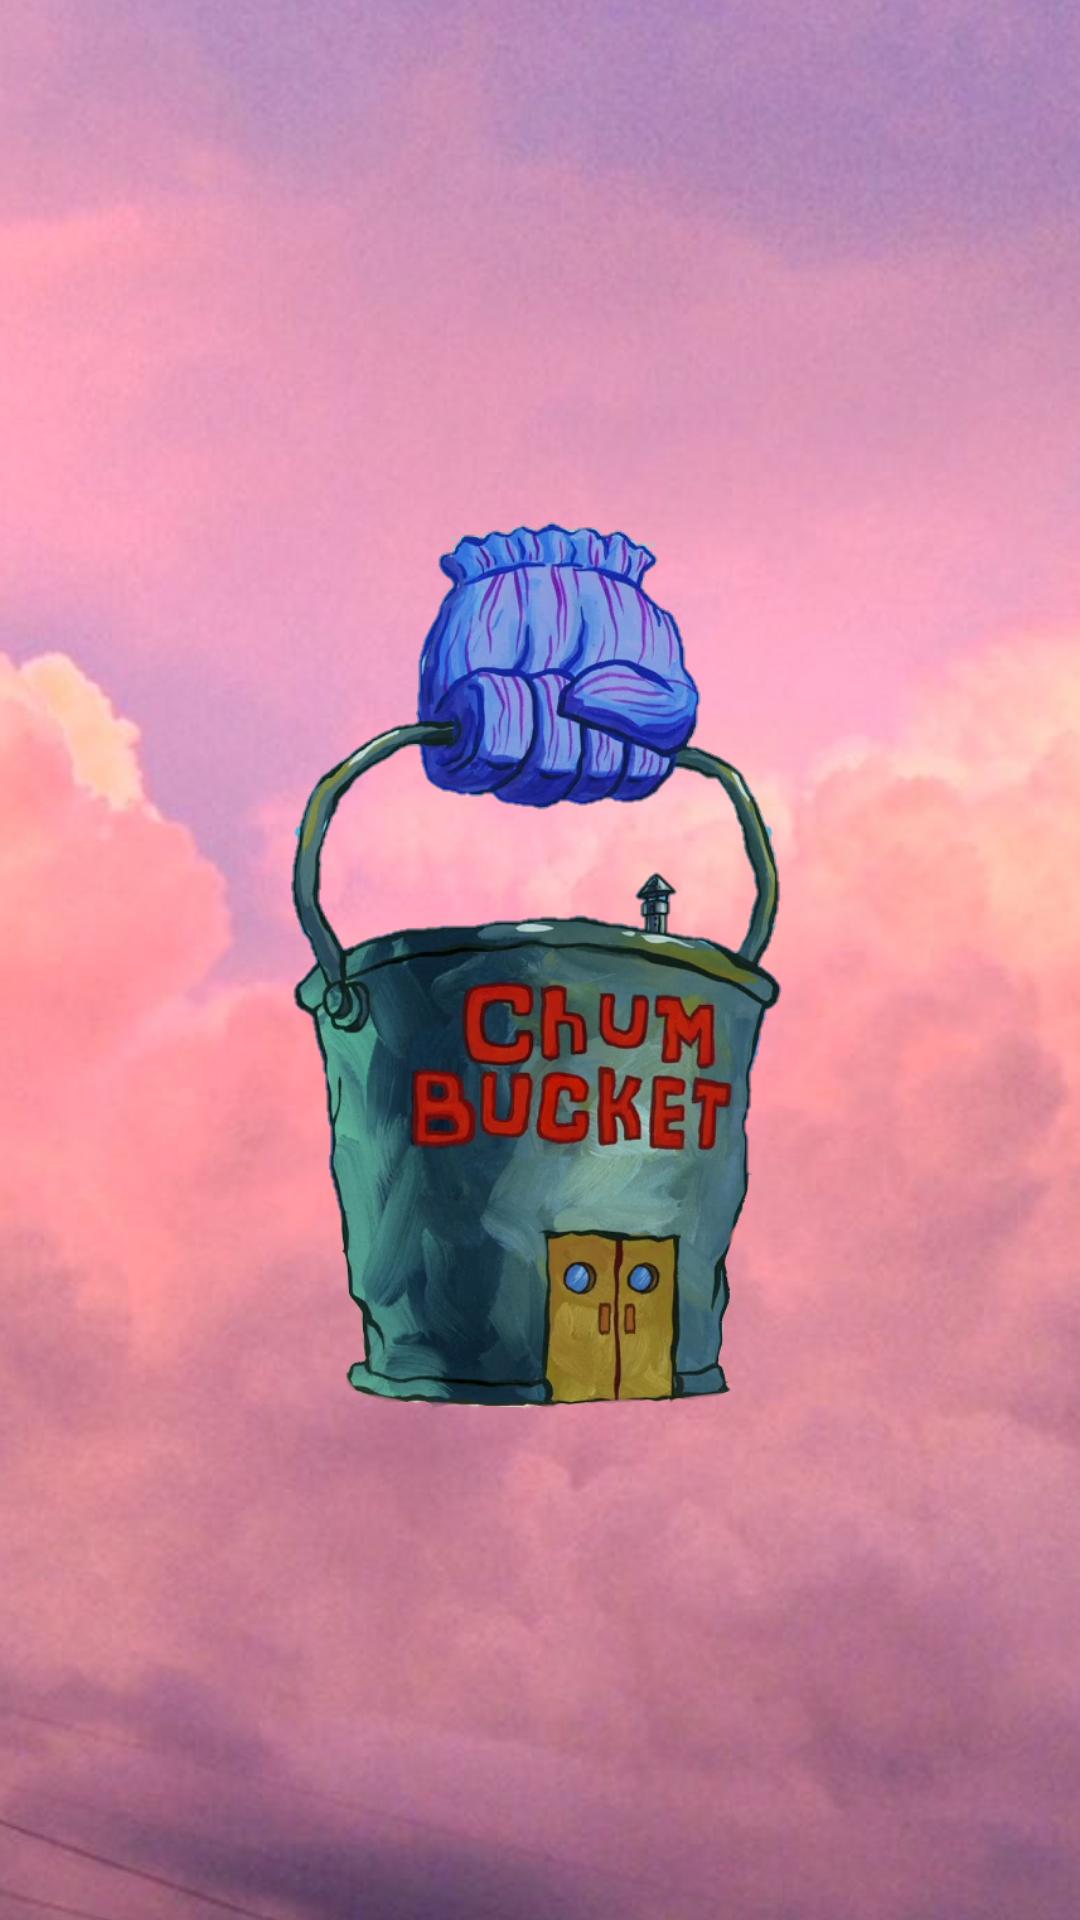 Vintage Aesthetic Spongebob Background